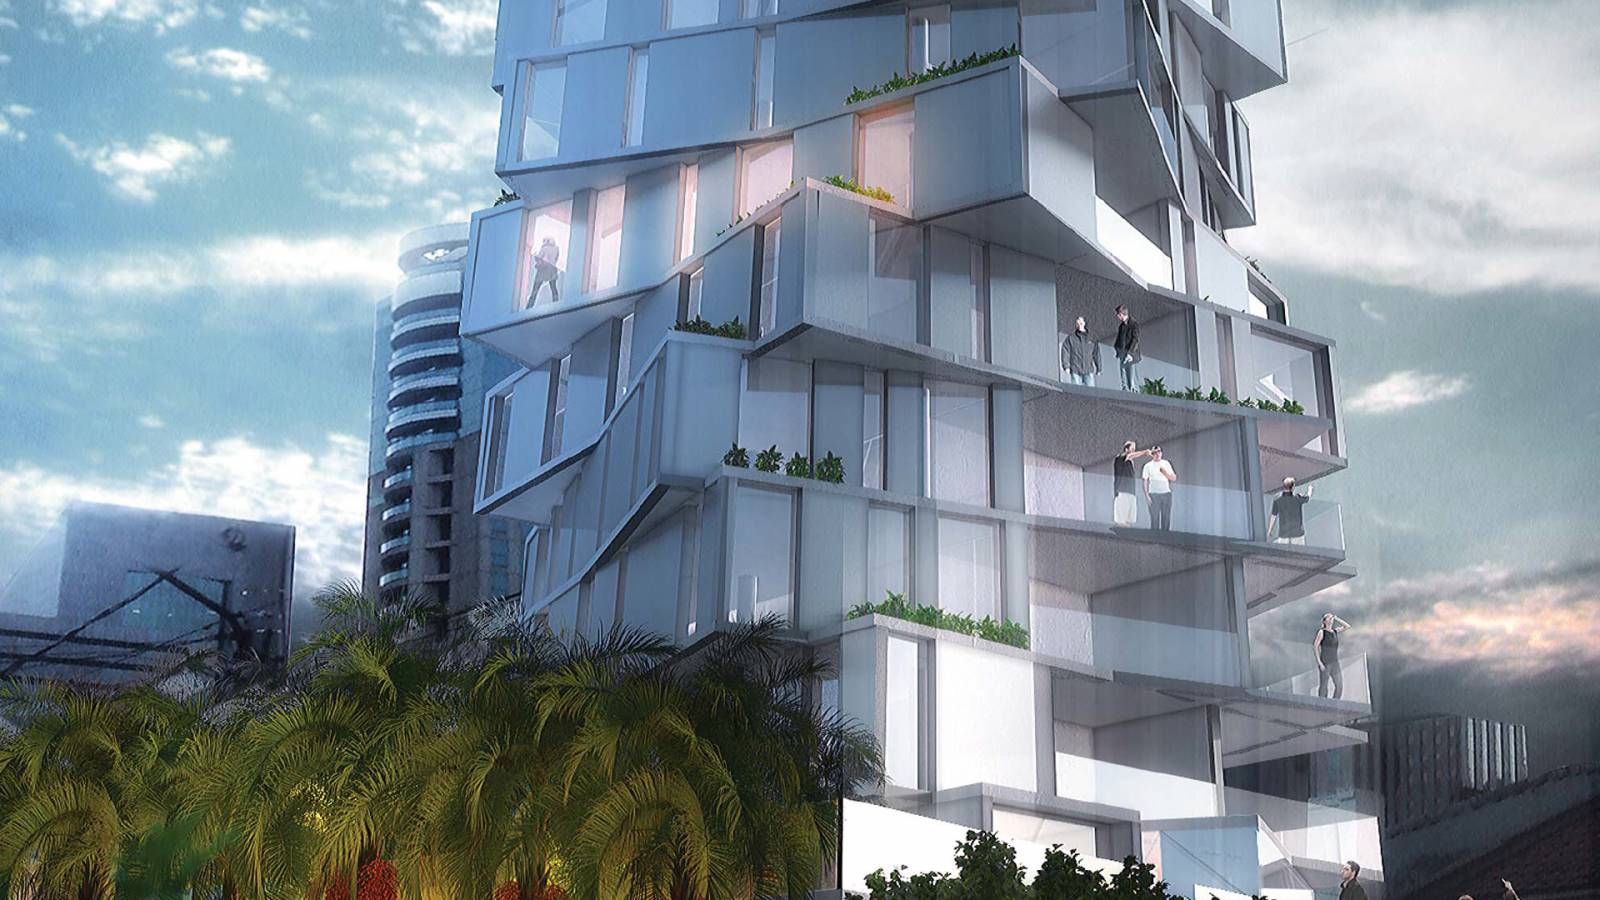 TOWER BASE - Huma Tower - SPOL Architects